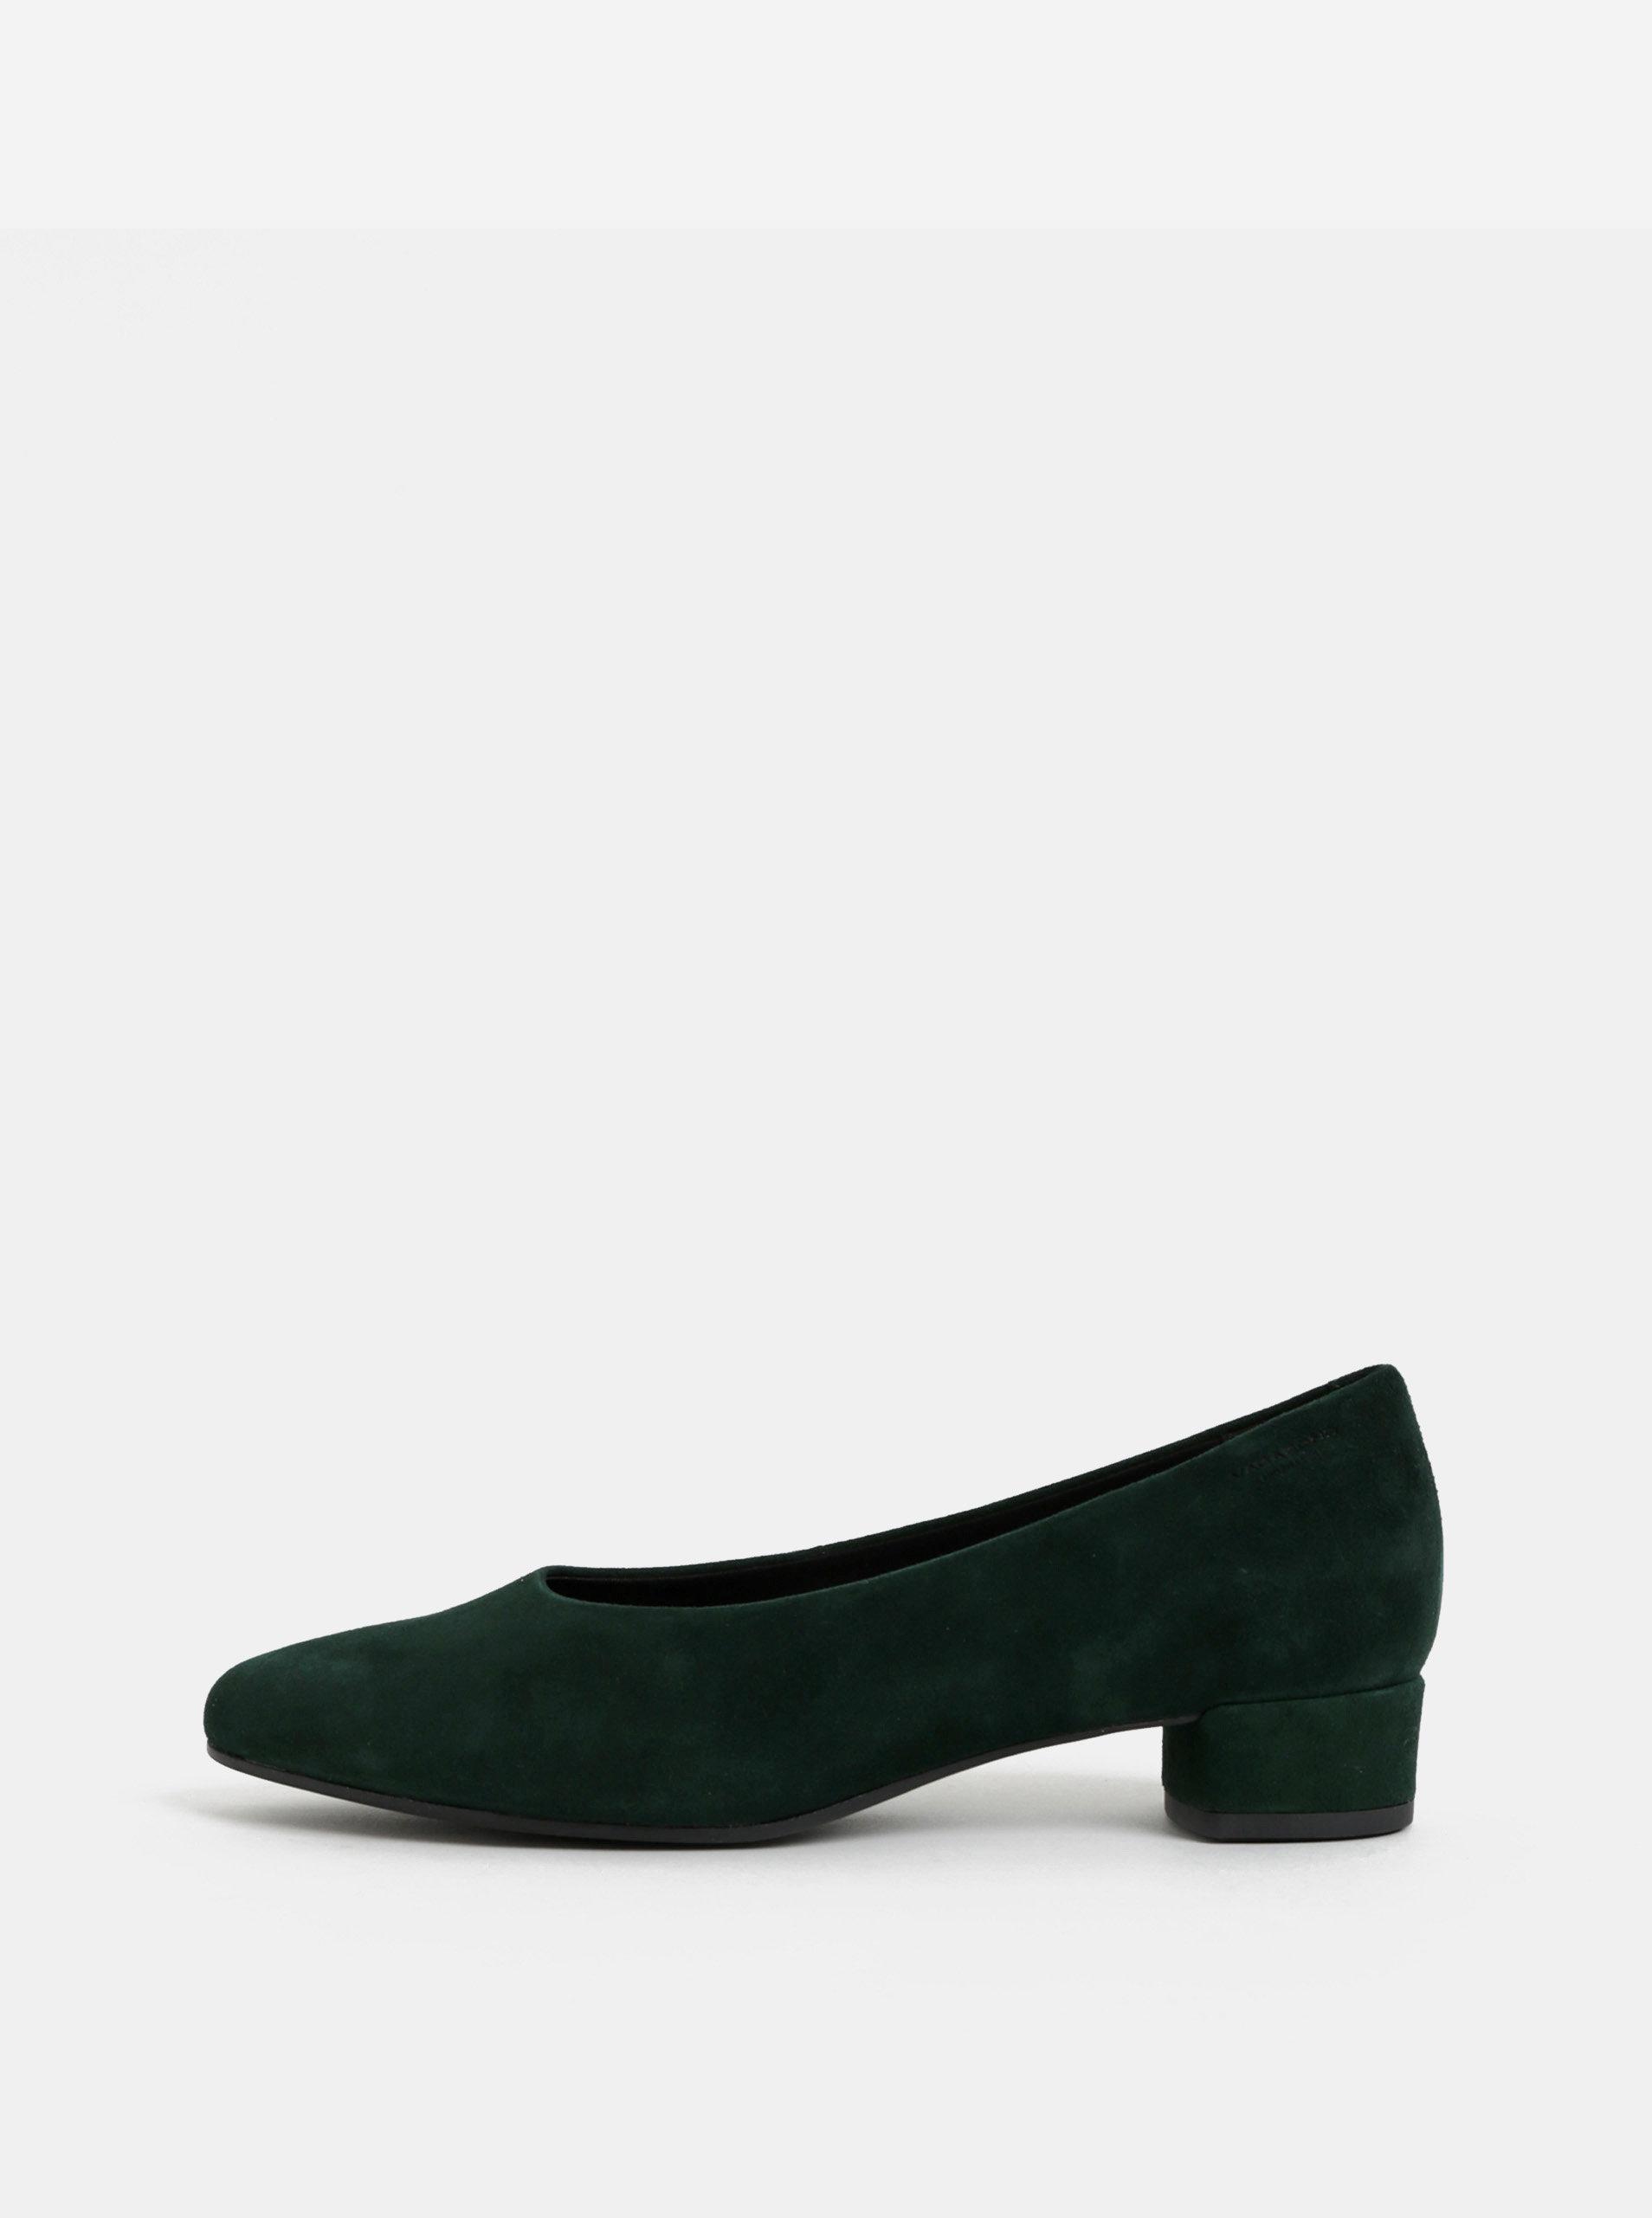 06df8eb25469 Tmavě zelené semišové lodičky na nízkém podpatku Vagabond Alicia ...